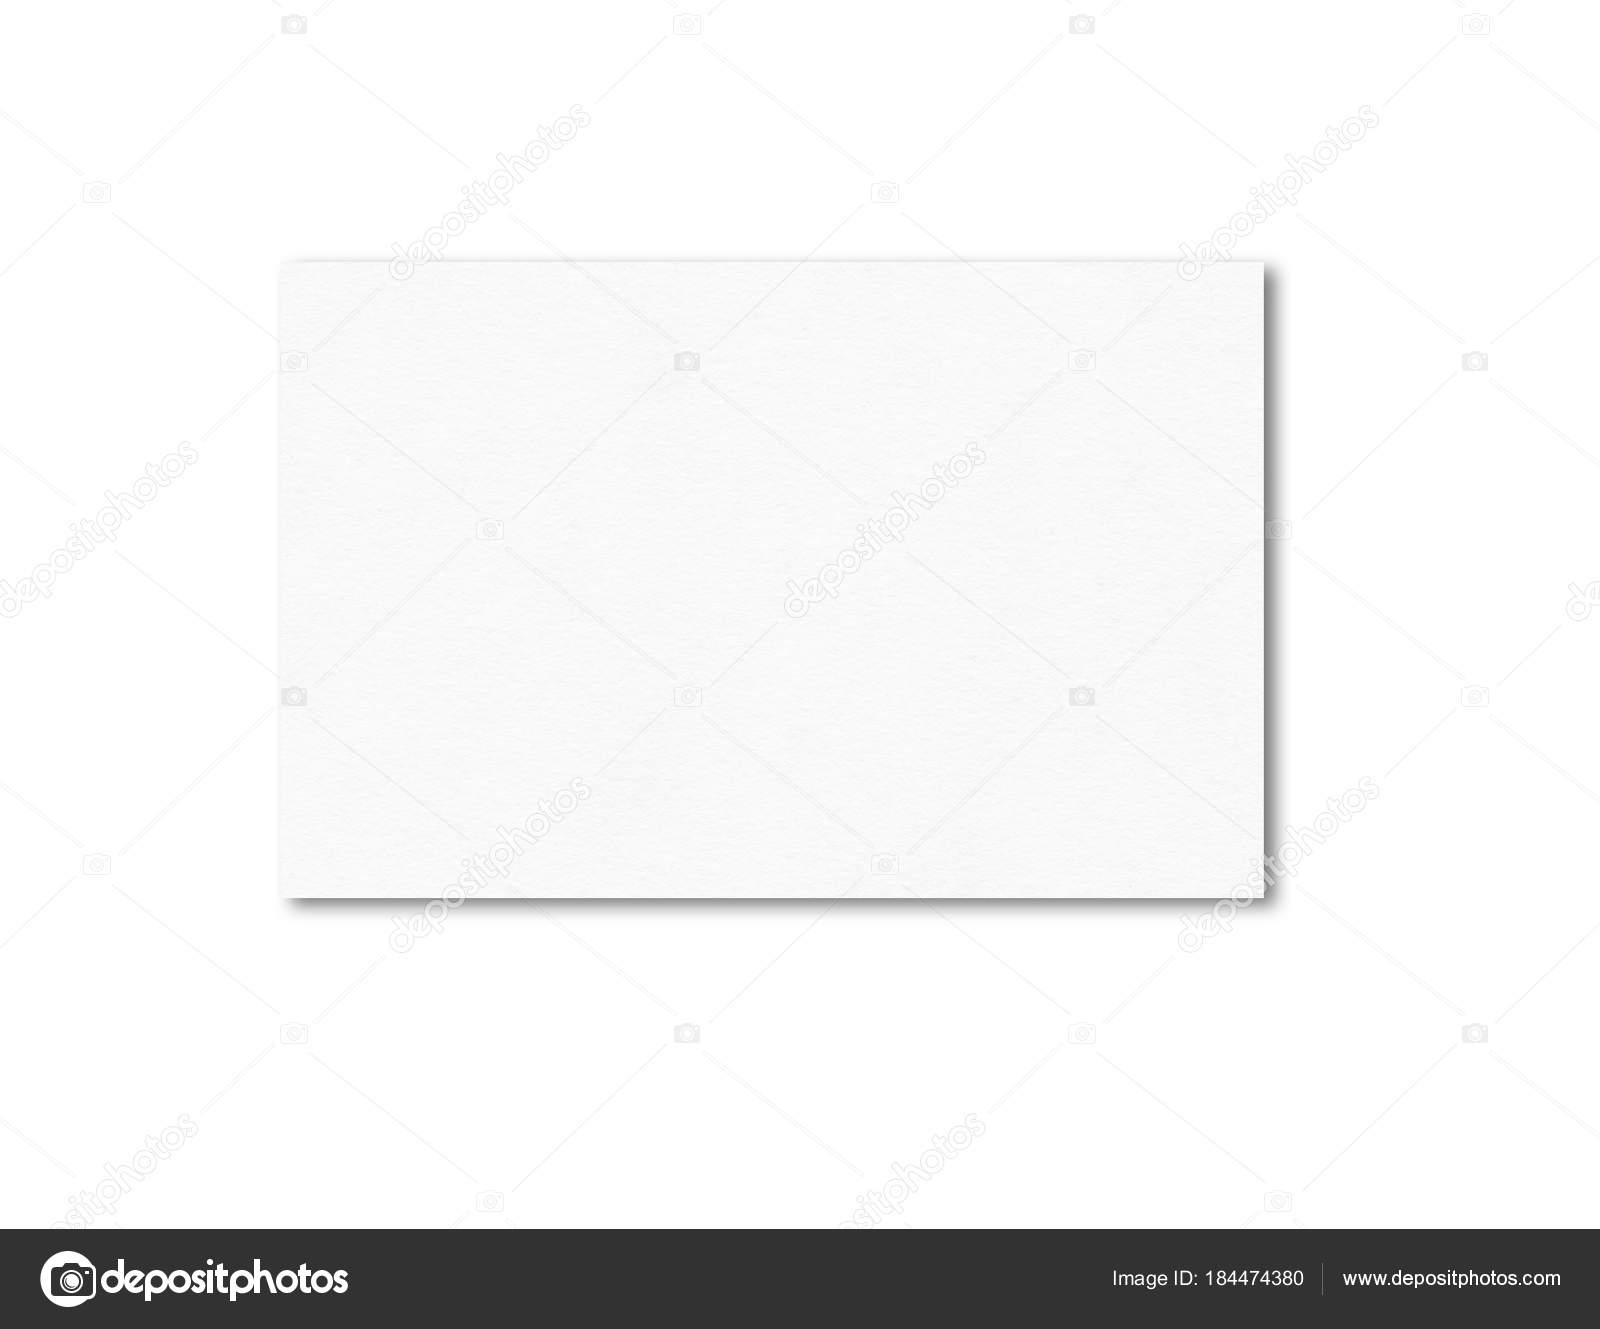 Blank business card mockup template — Stock Photo © daboost #184474380